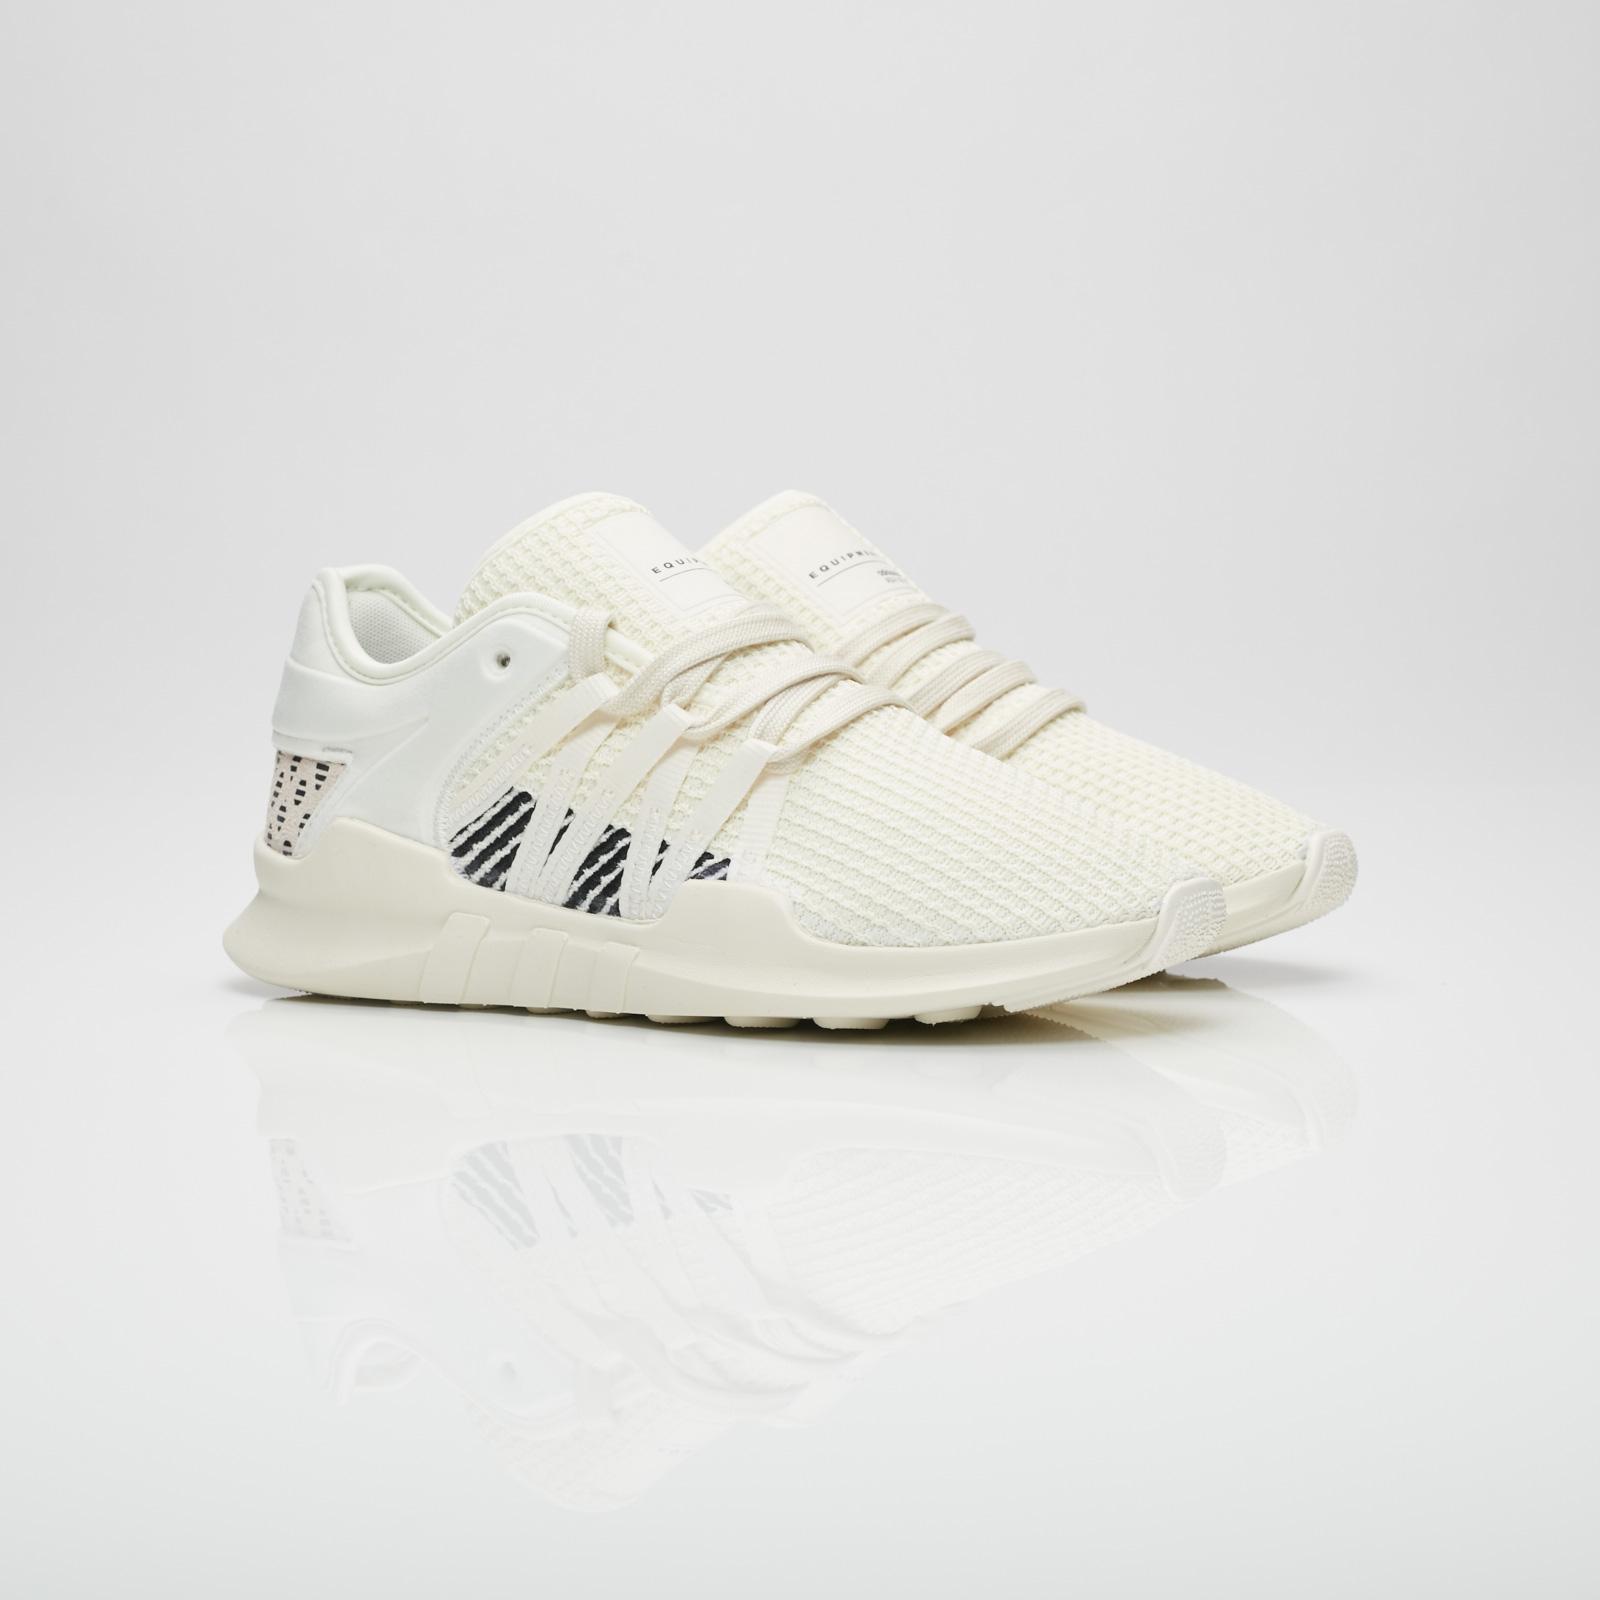 adidas EQT Racing ADV W - By9799 - SNS   sneakers & streetwear ...